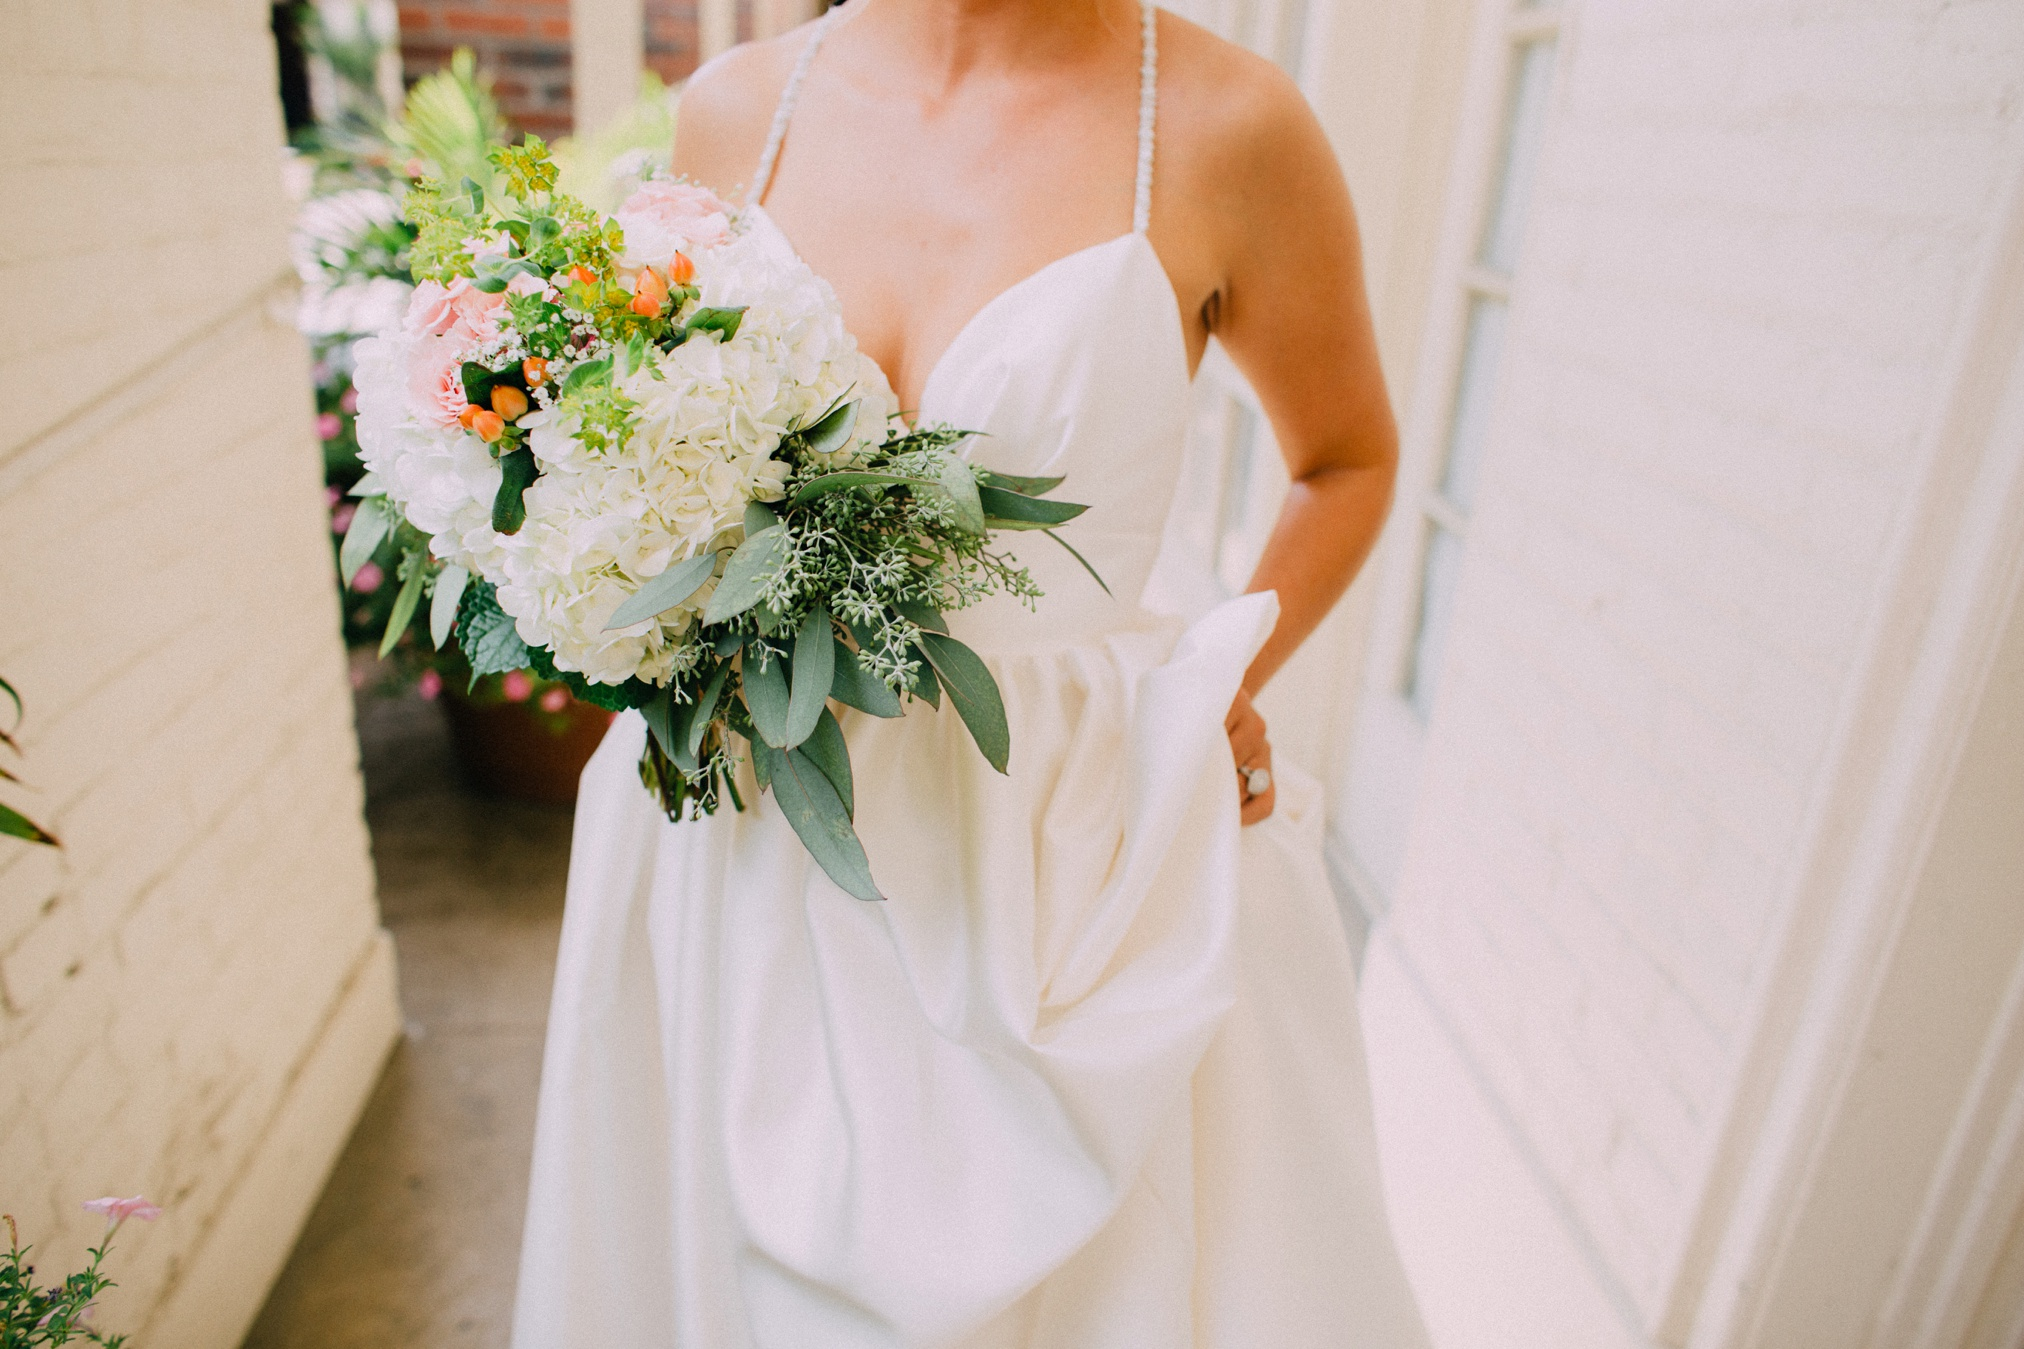 brenna+michael_wedding-220.jpg